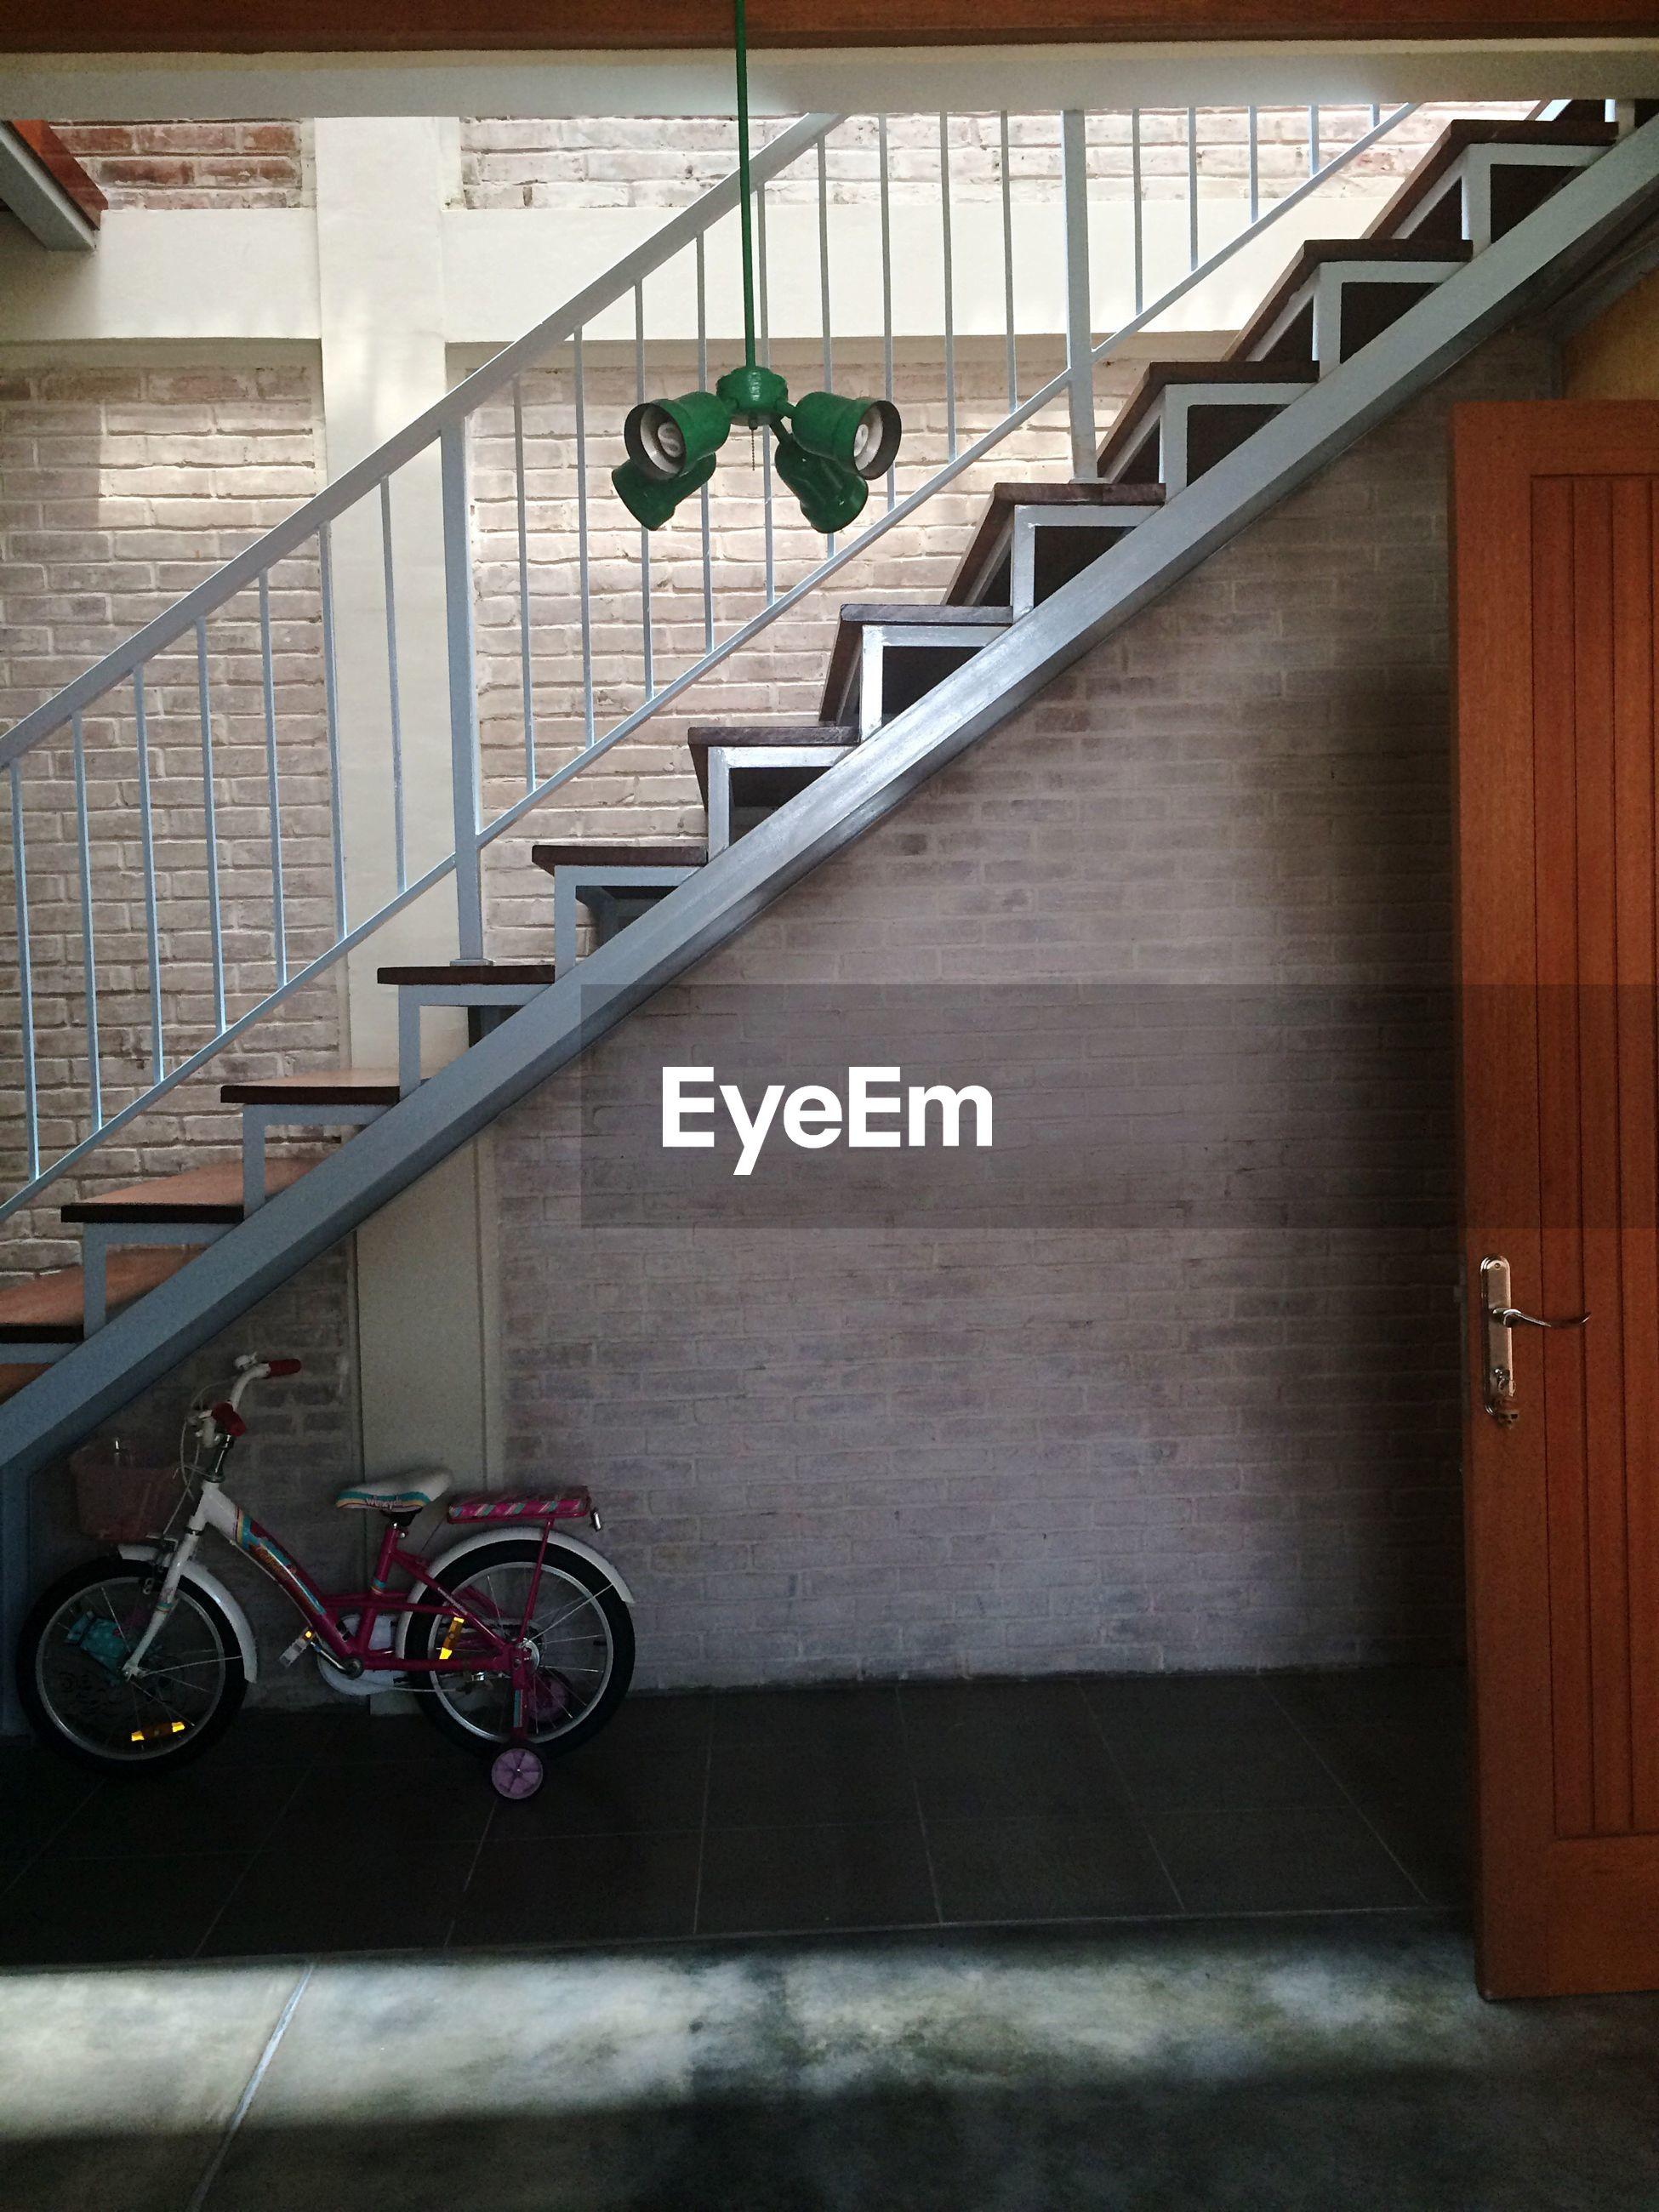 Bicycle below staircase in building